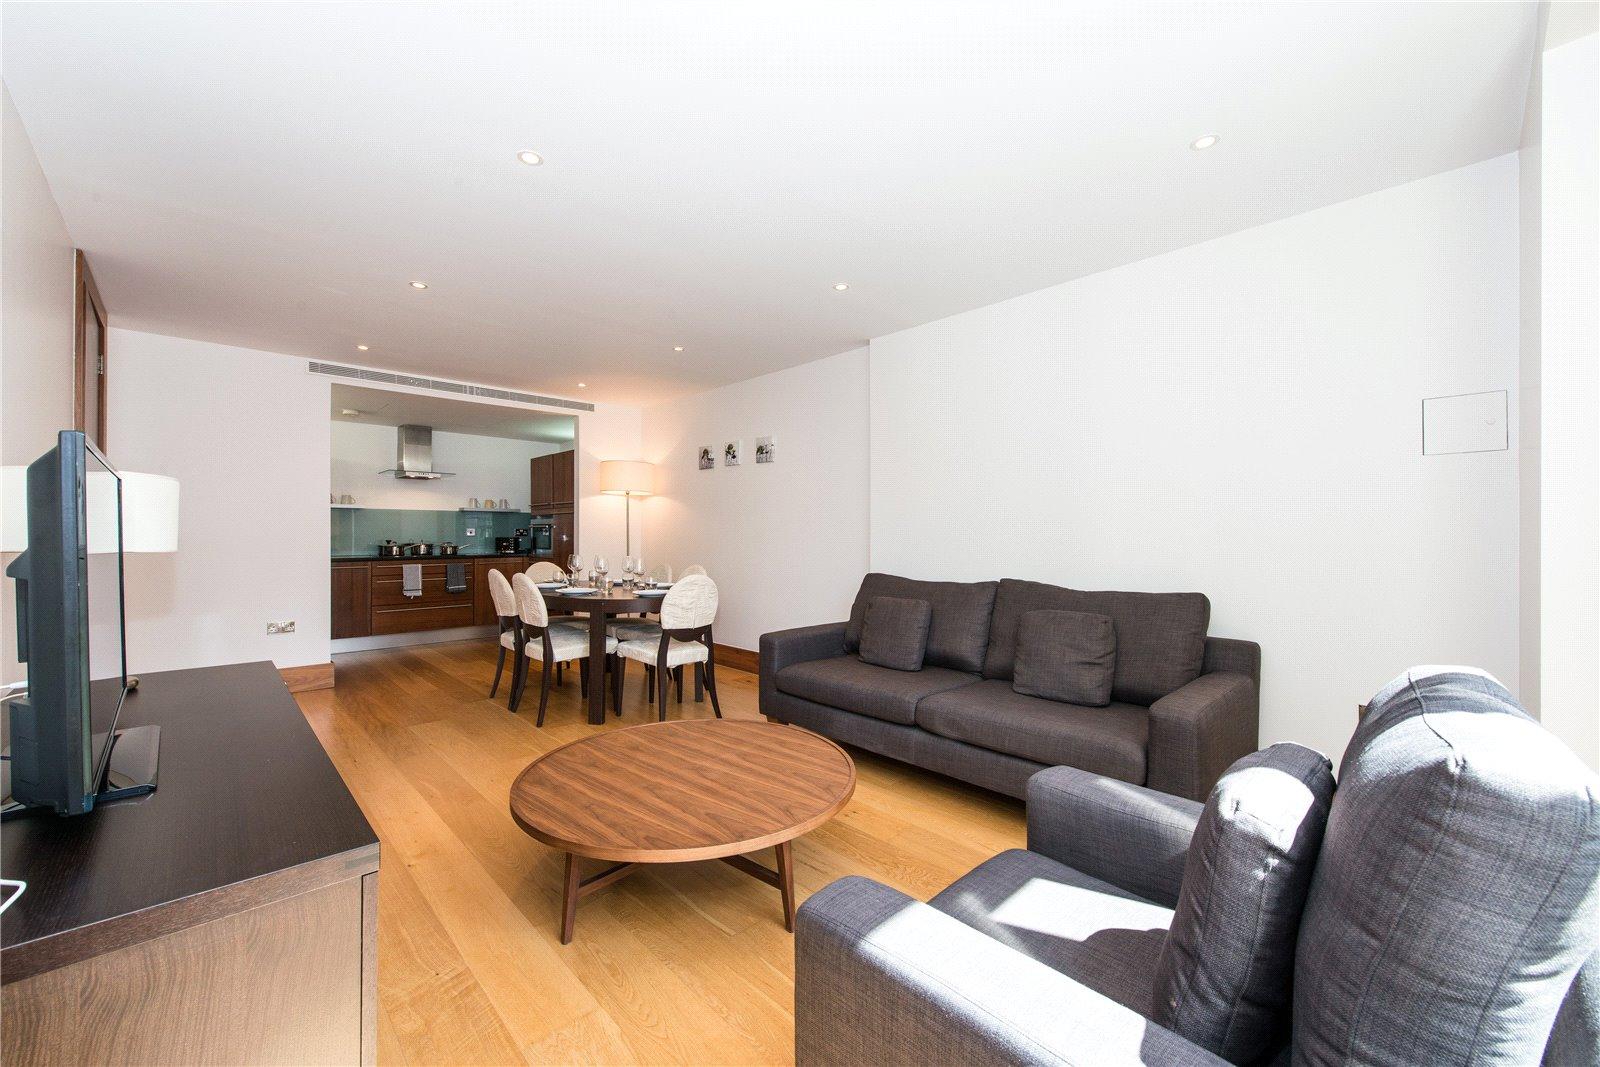 Apartment for Rent at Parkview Residence, Baker Street, Marylebone, London, NW1 Parkview Residence, Baker Street, Marylebone, London, NW1